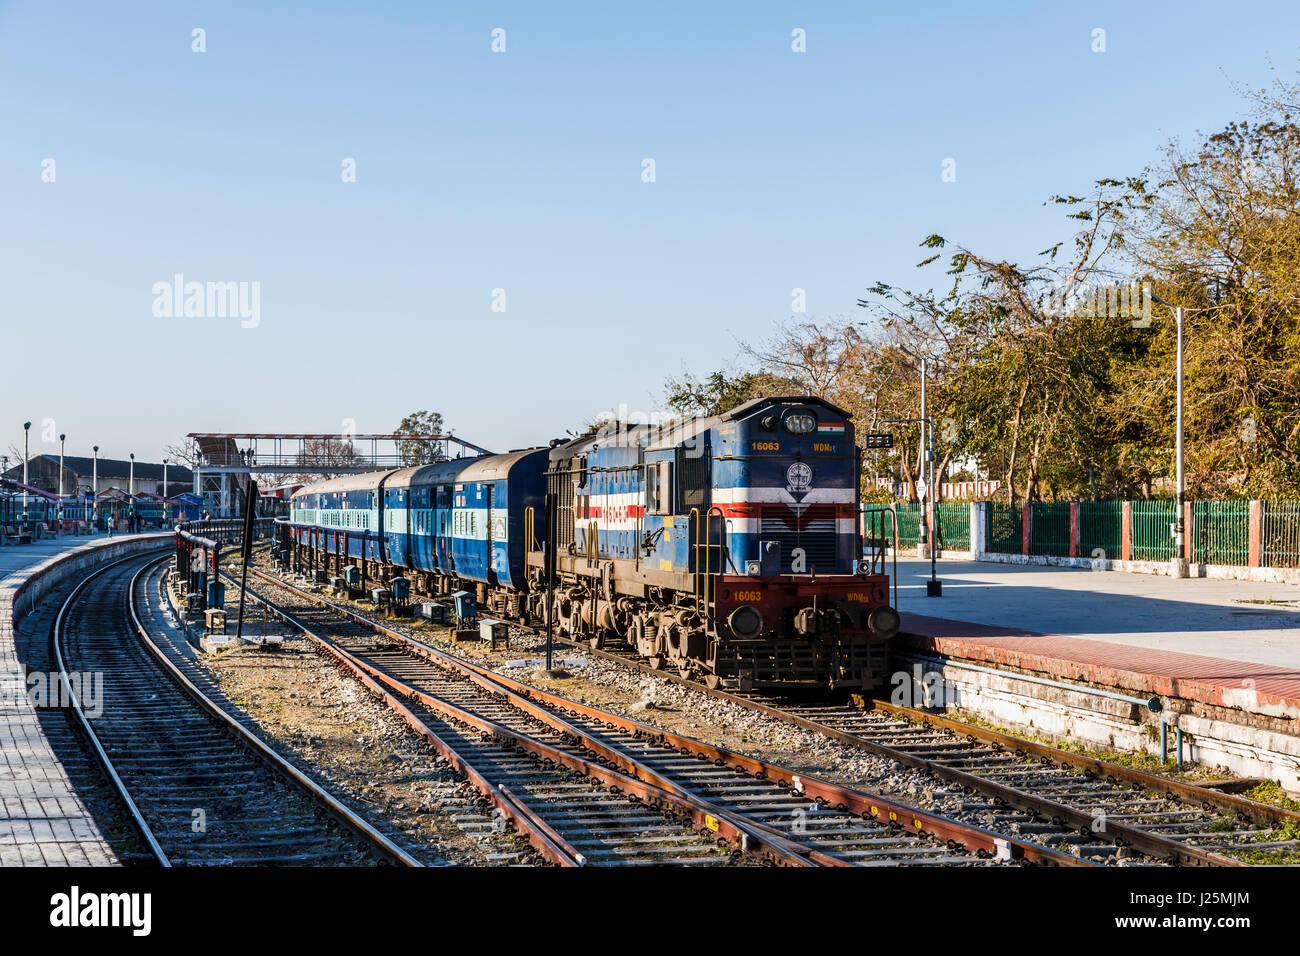 indian railway engine stock photos indian railway engine stock